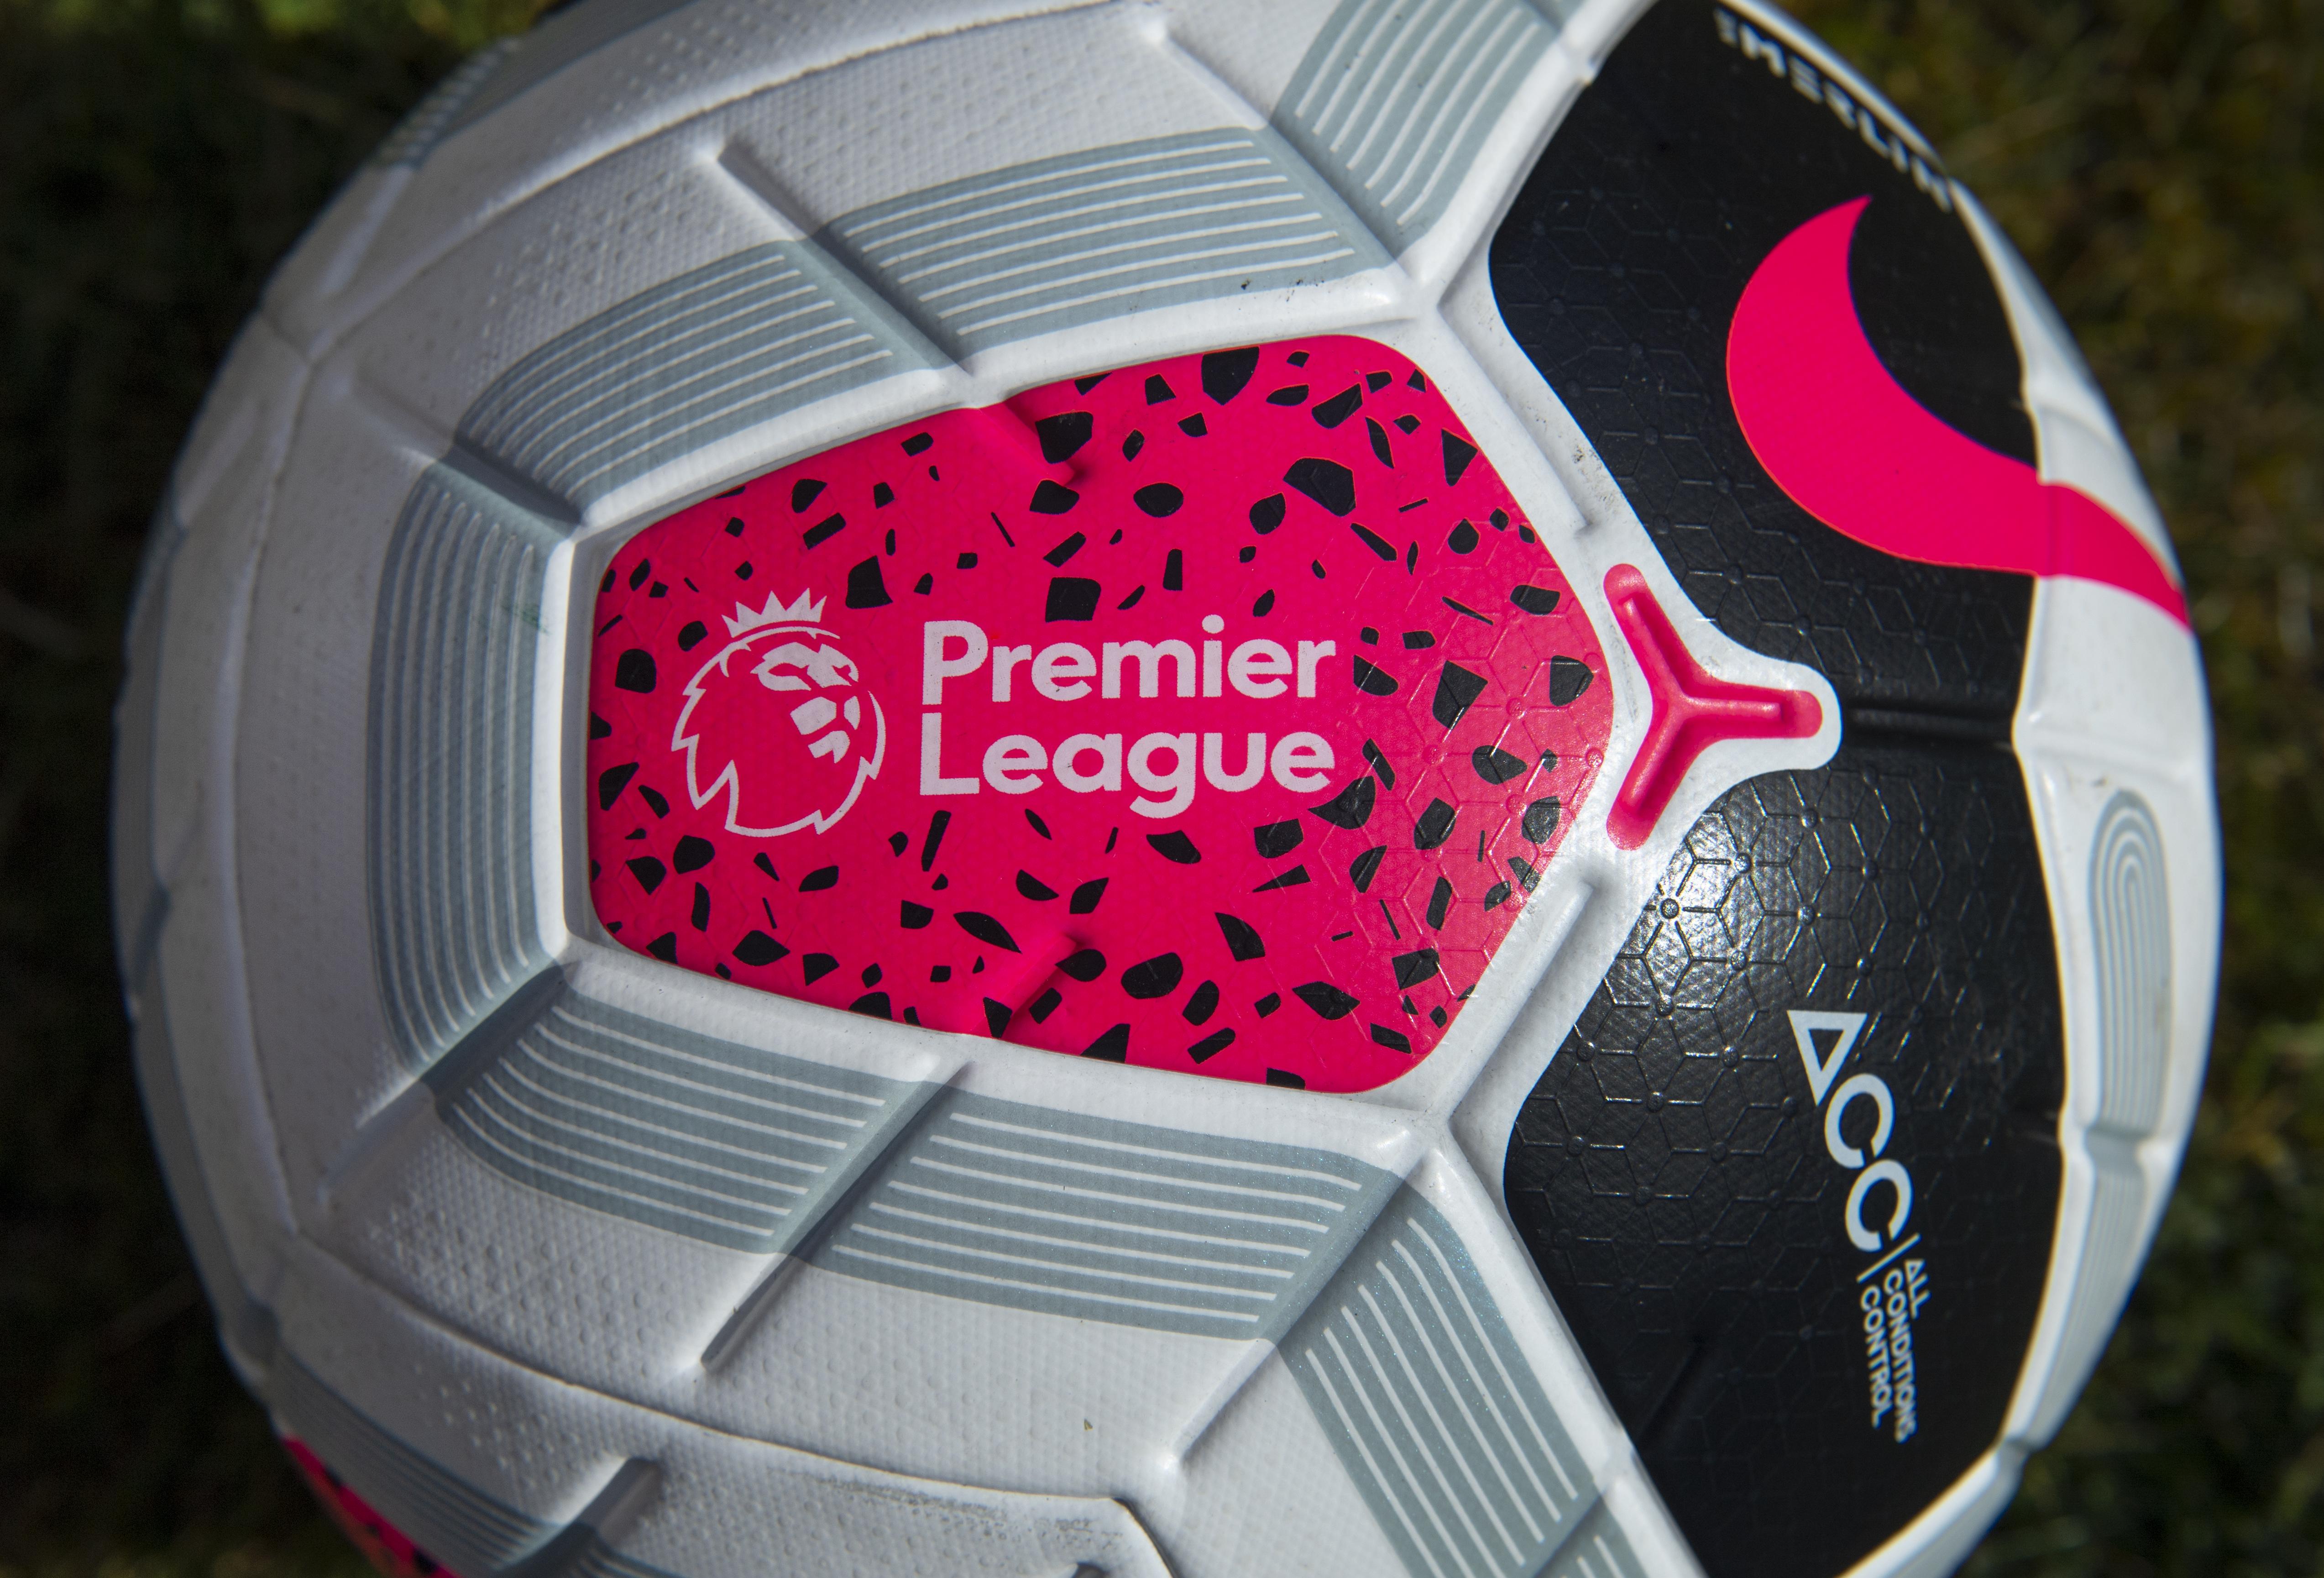 The Officail Premier League Match Ball